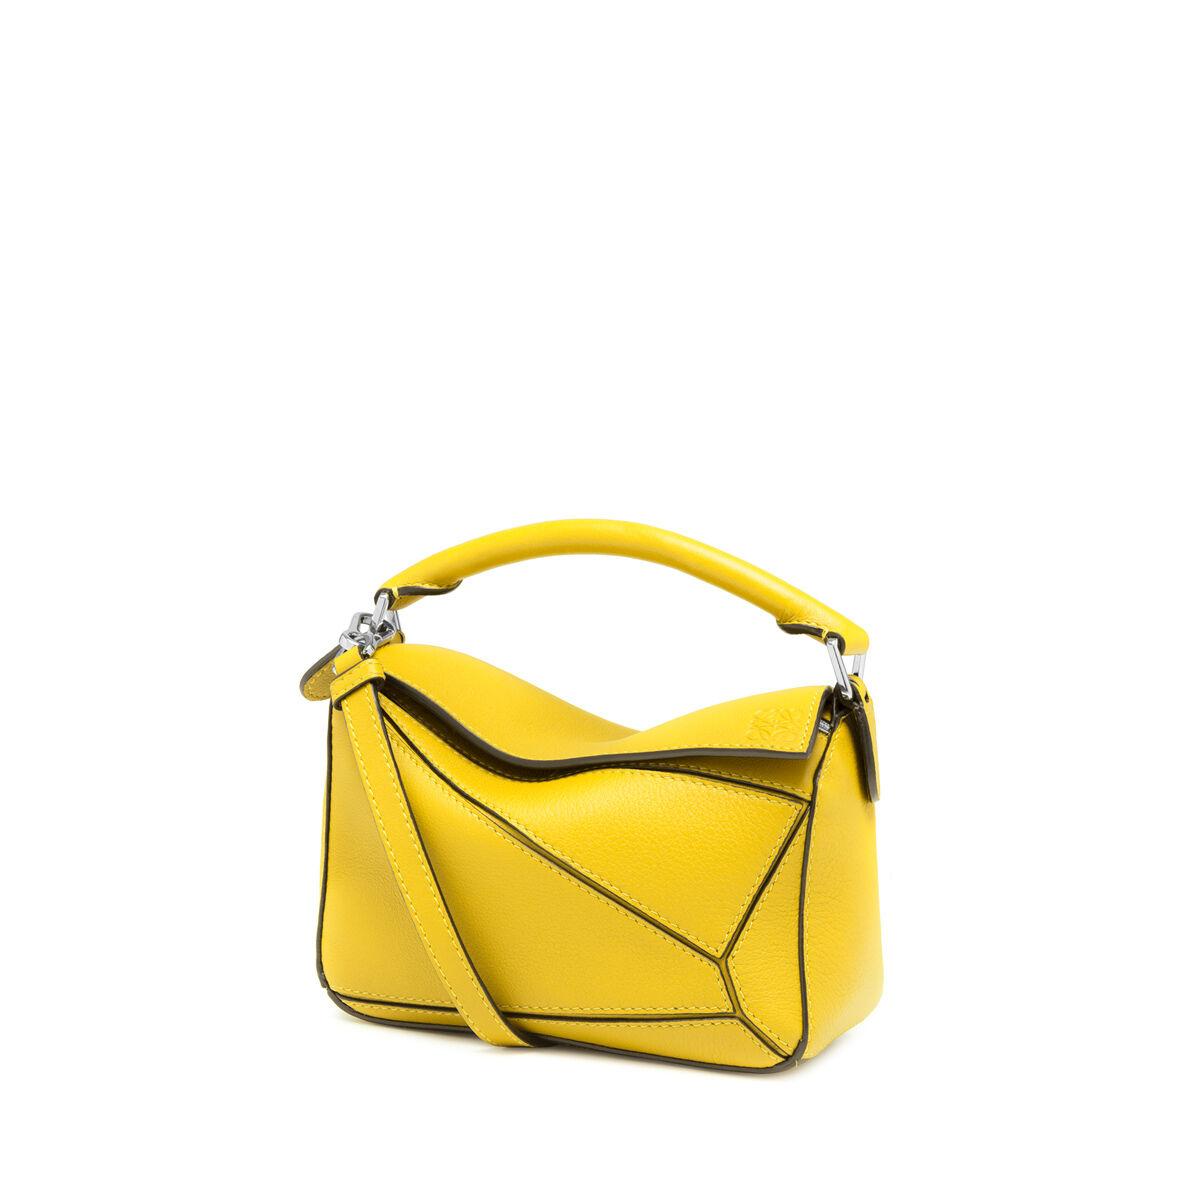 LOEWE Mini Puzzle Bag 黄色 all